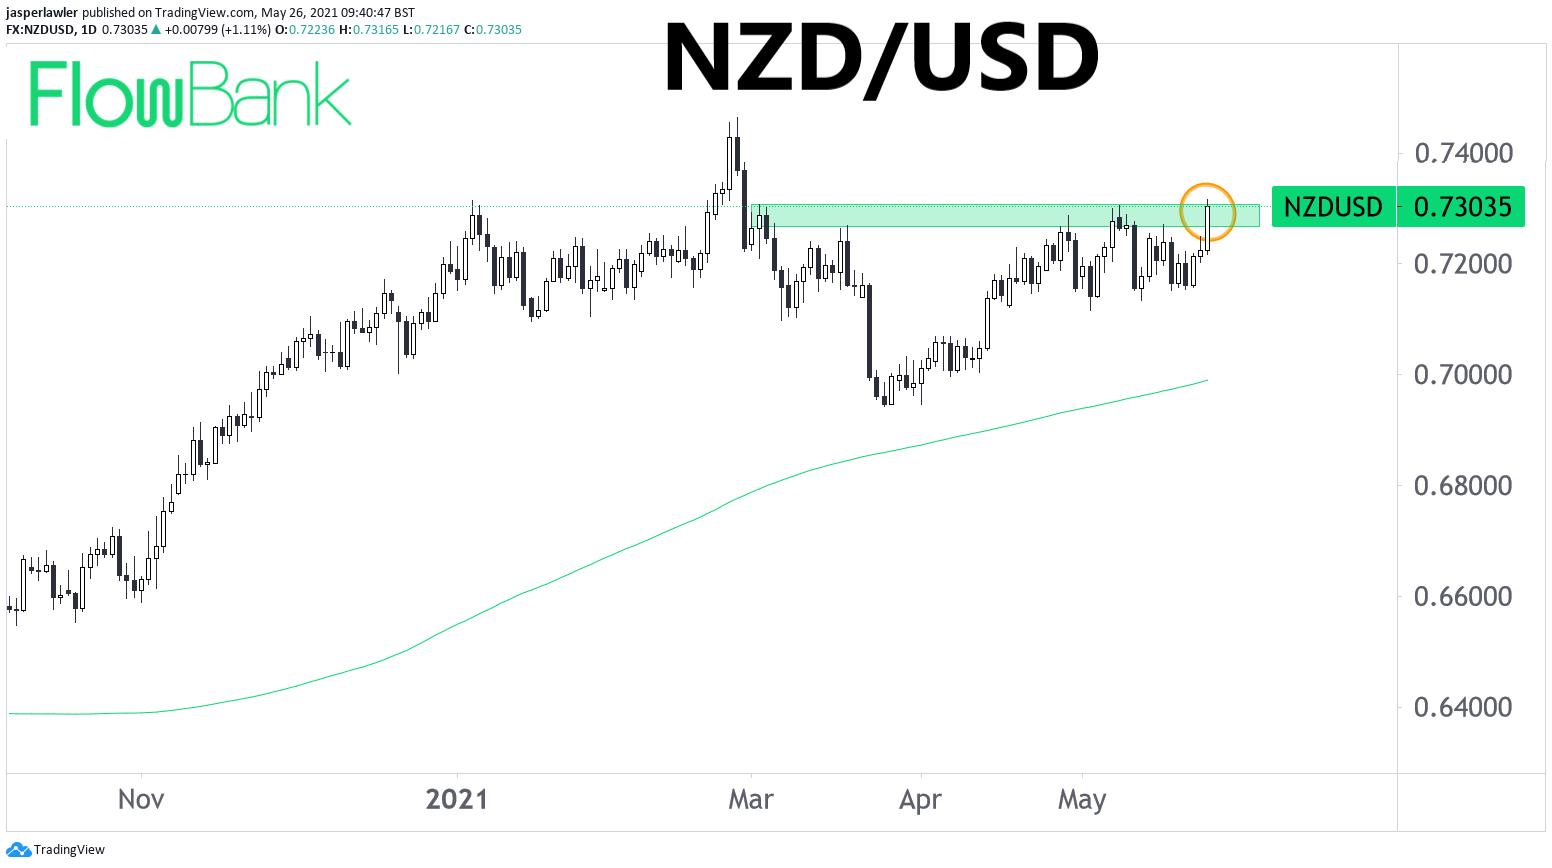 Forex News: Kiwi dollar hits 3-month high after hawkish RBNZ #NZDUSD